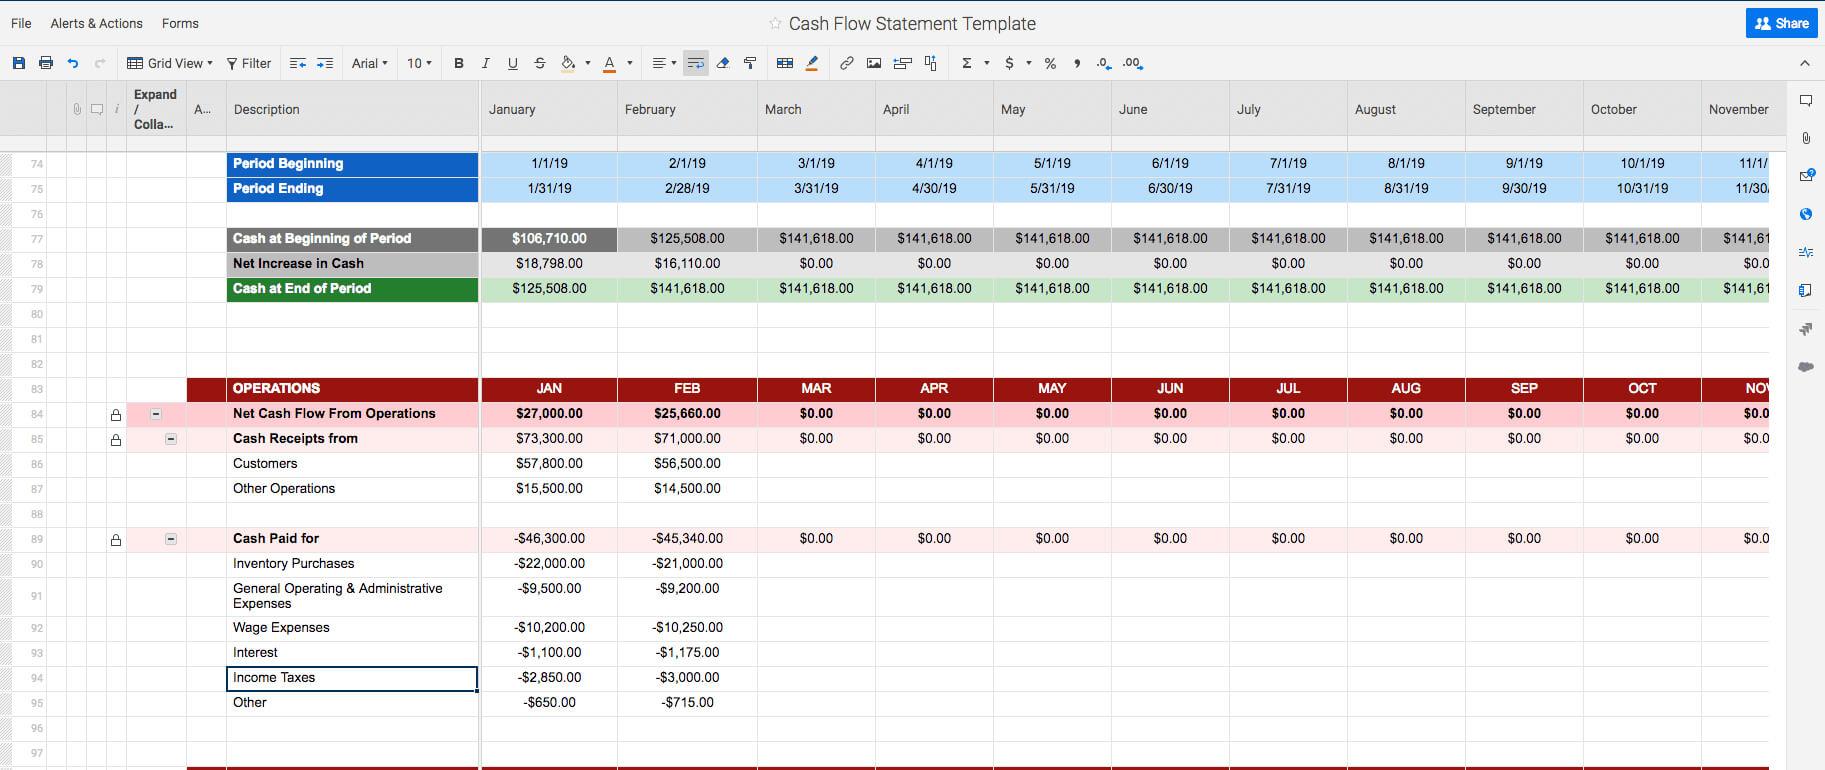 Free Cash Flow Statement Templates | Smartsheet With Cash Position Report Template